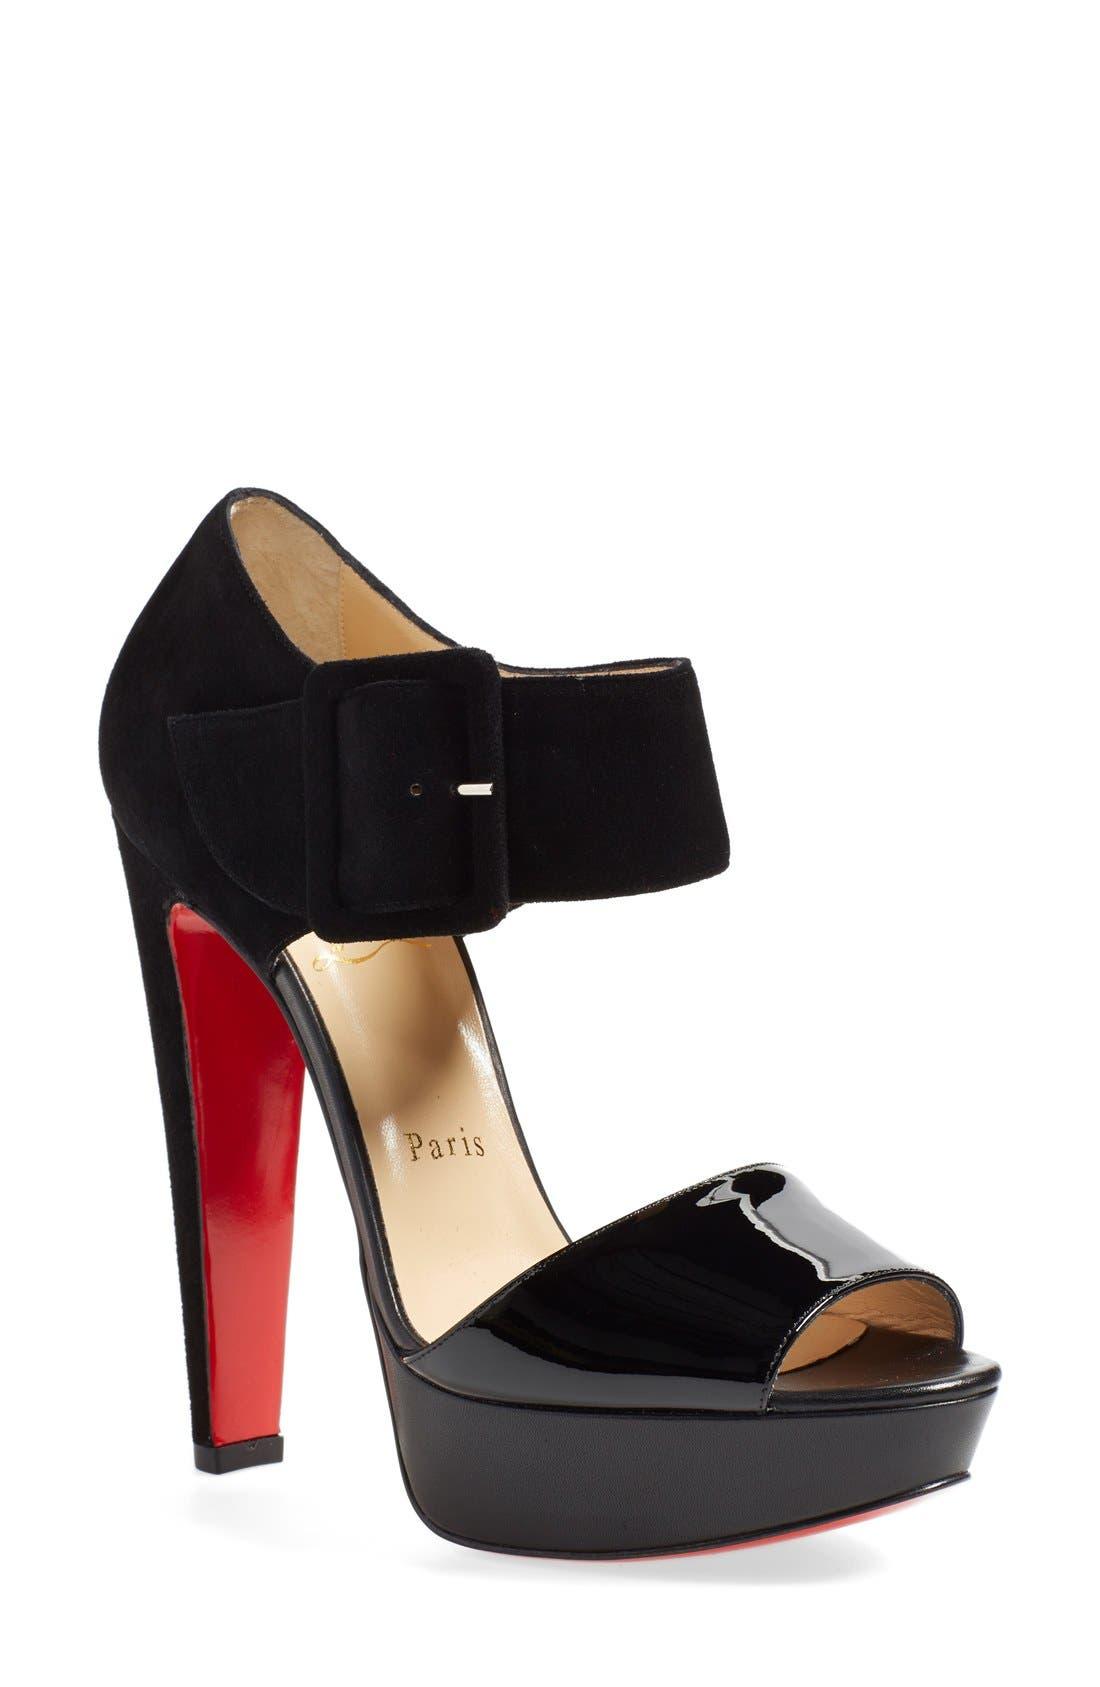 Main Image - Christian Louboutin 'Haute Retenue' Platform Sandal